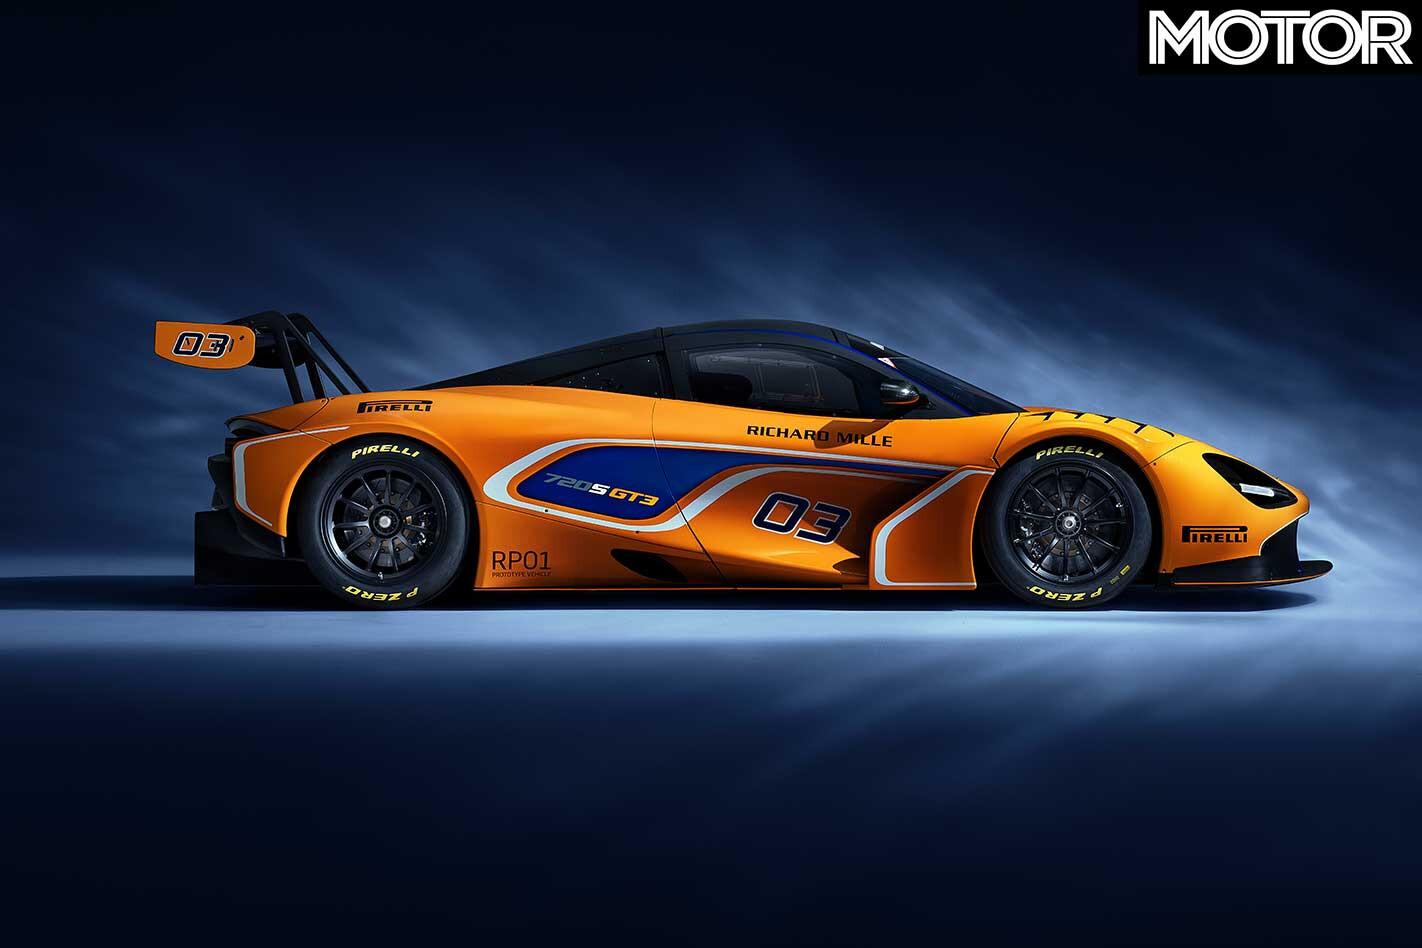 Mc Laren 720 S GT 3 Side Profile Jpg